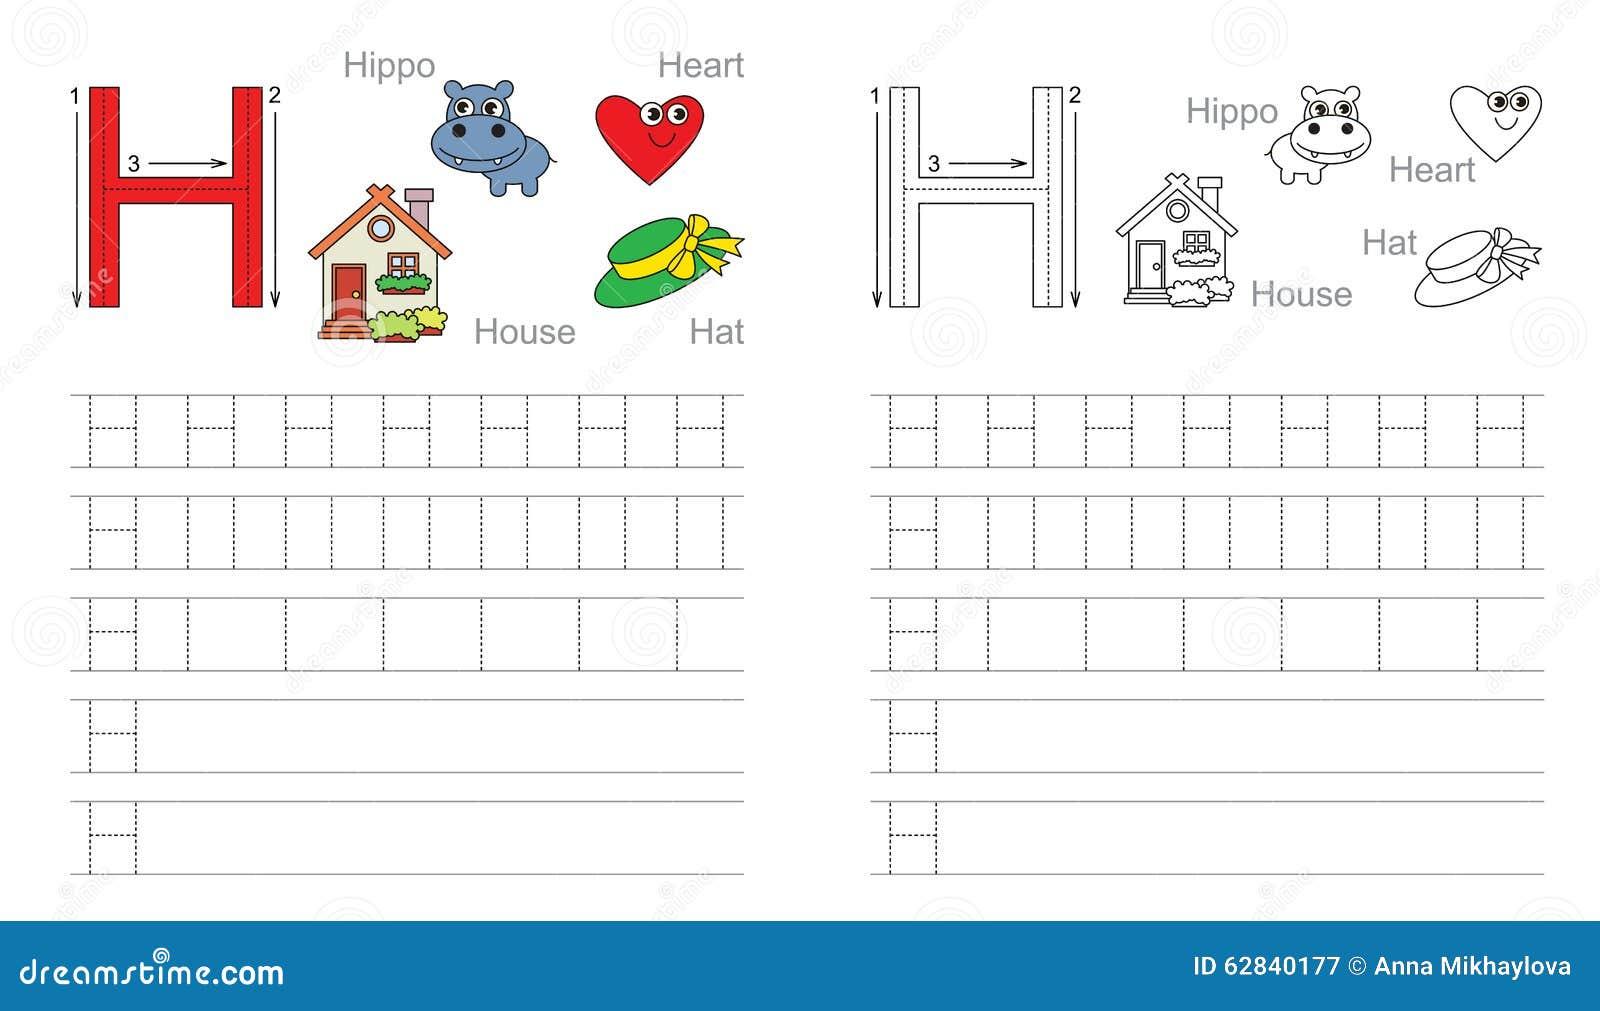 worksheet H Handwriting Worksheet tracing worksheet for letter h stock vector illustration of h